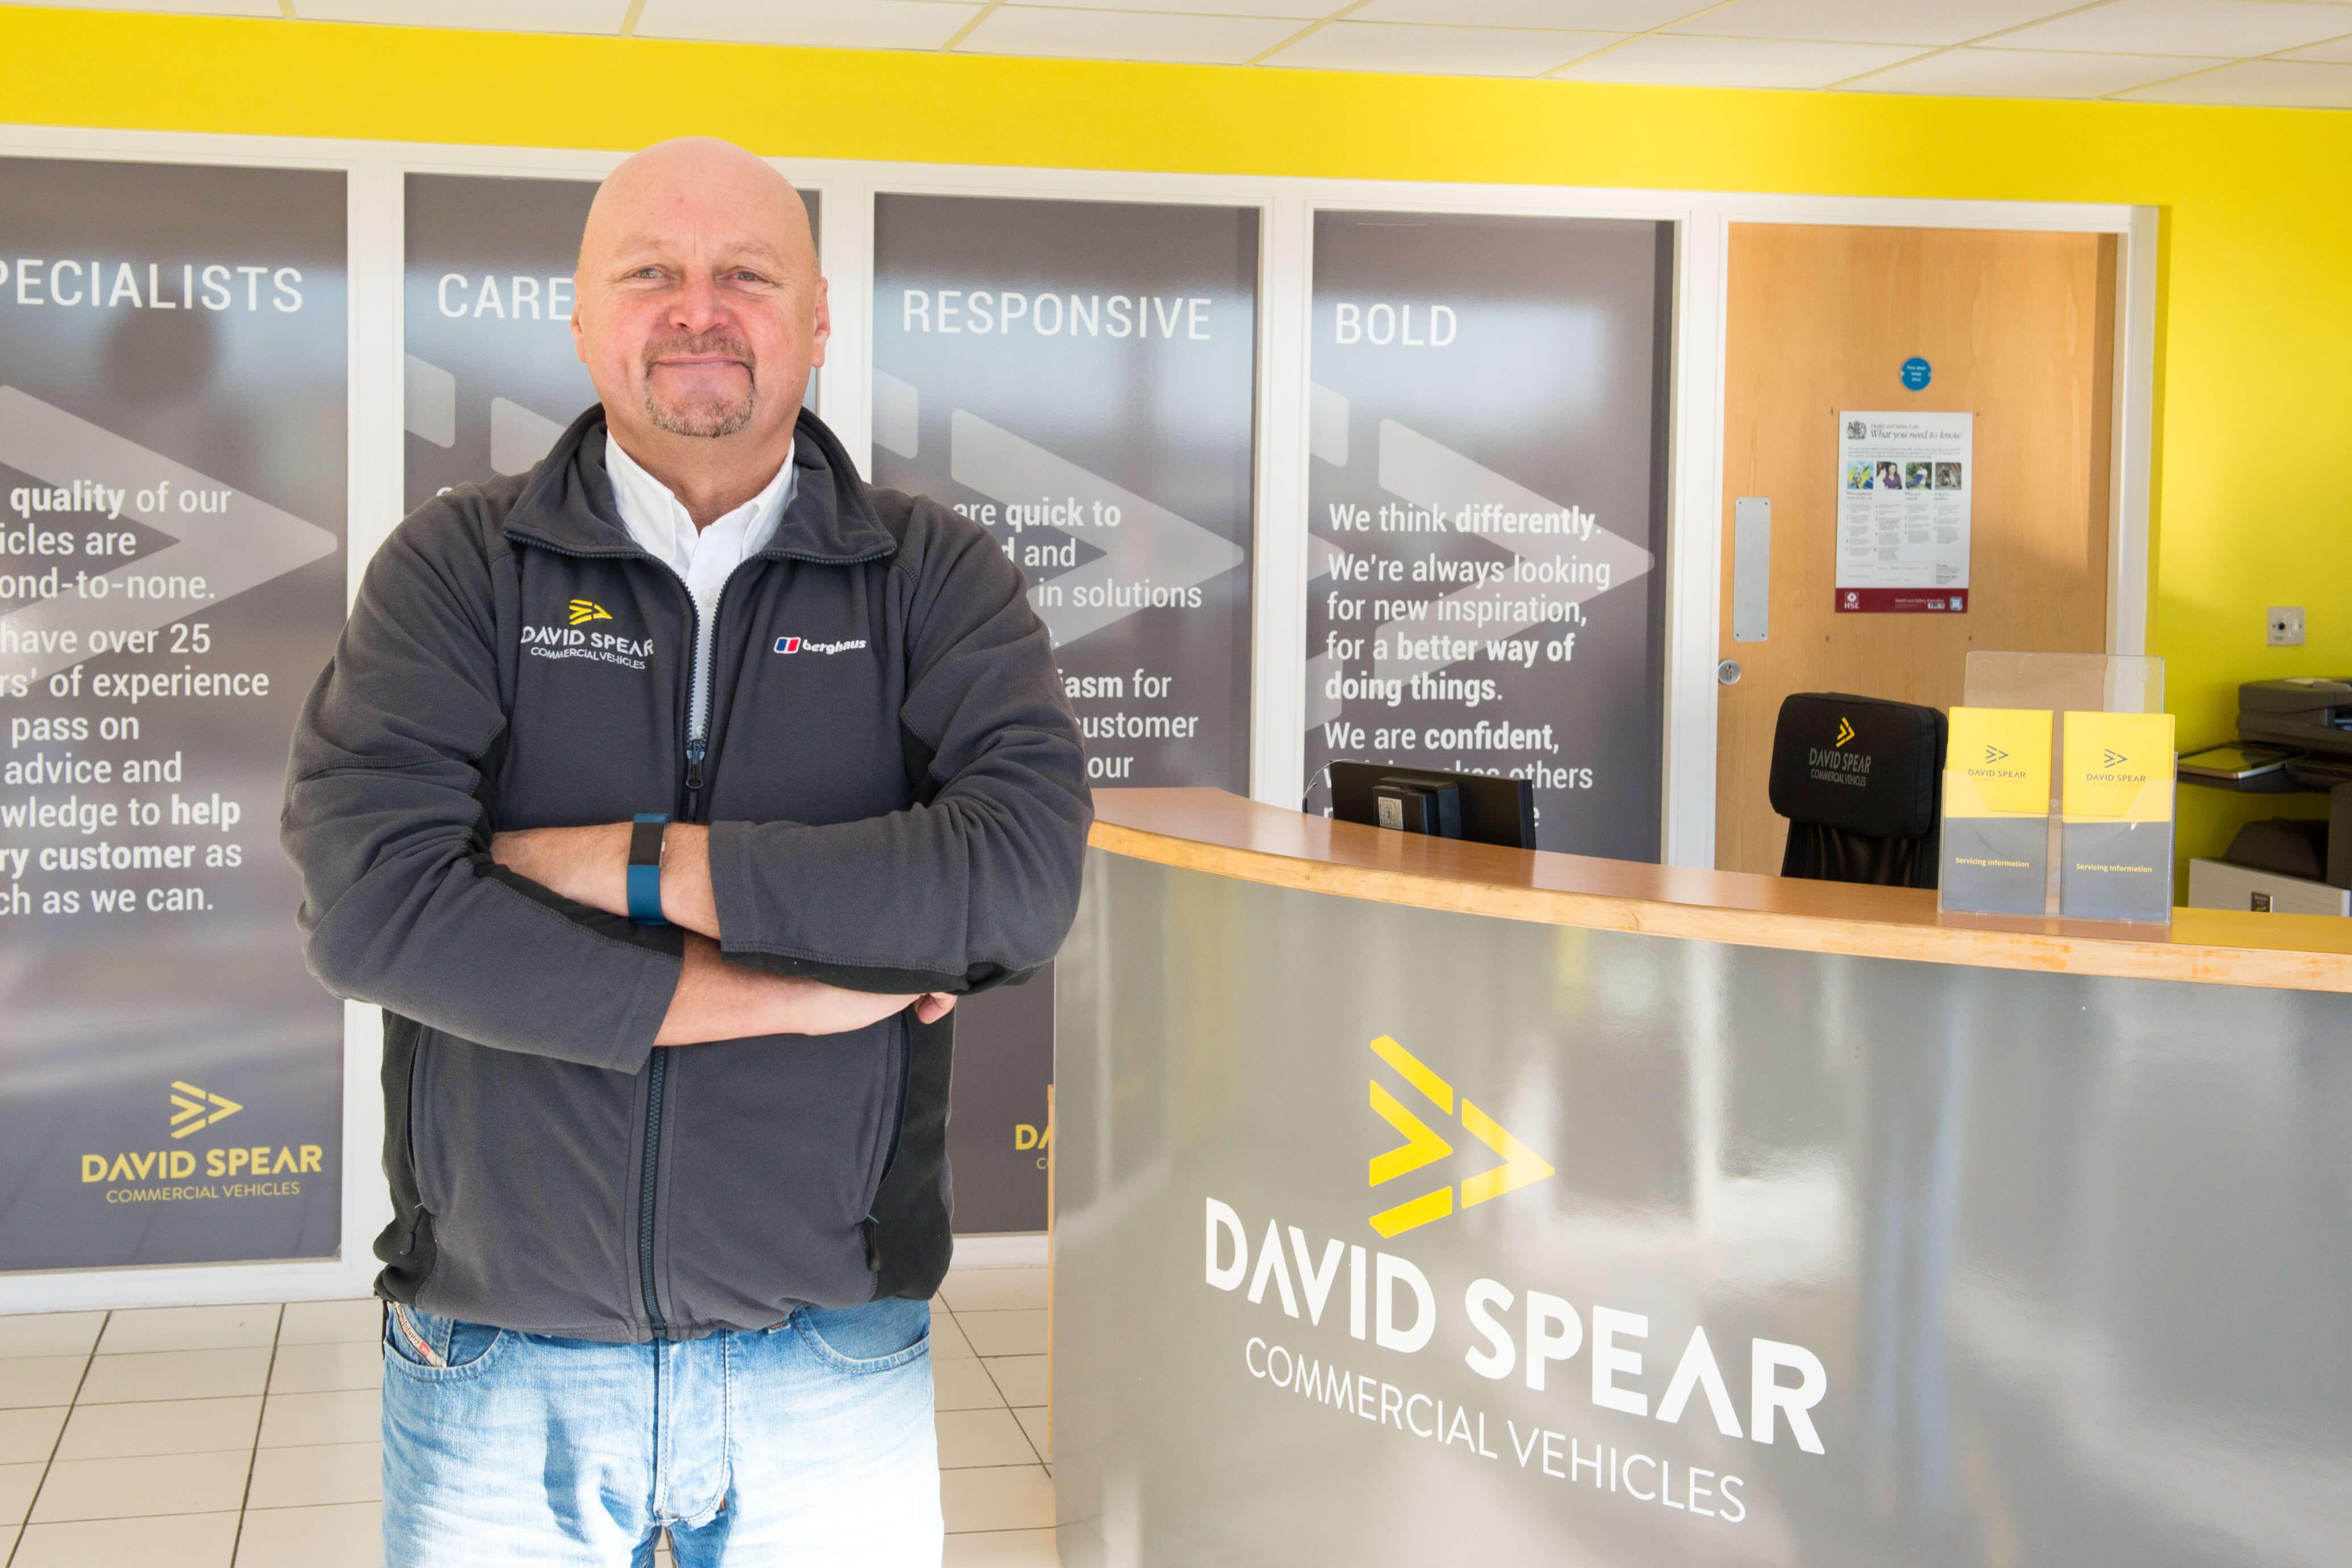 Christopher Morgan, Van Dealership South Wales UK